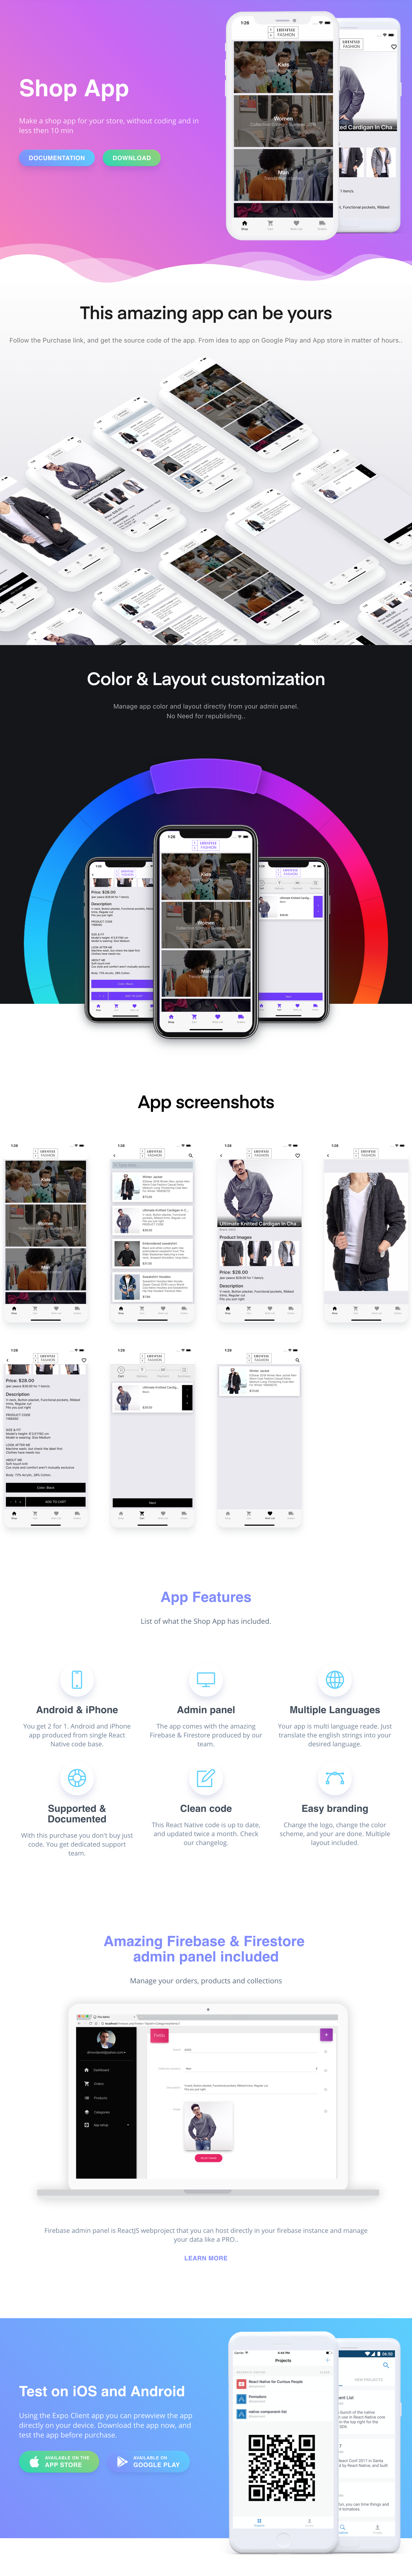 Full Mobile  Shop app - React Native - 1